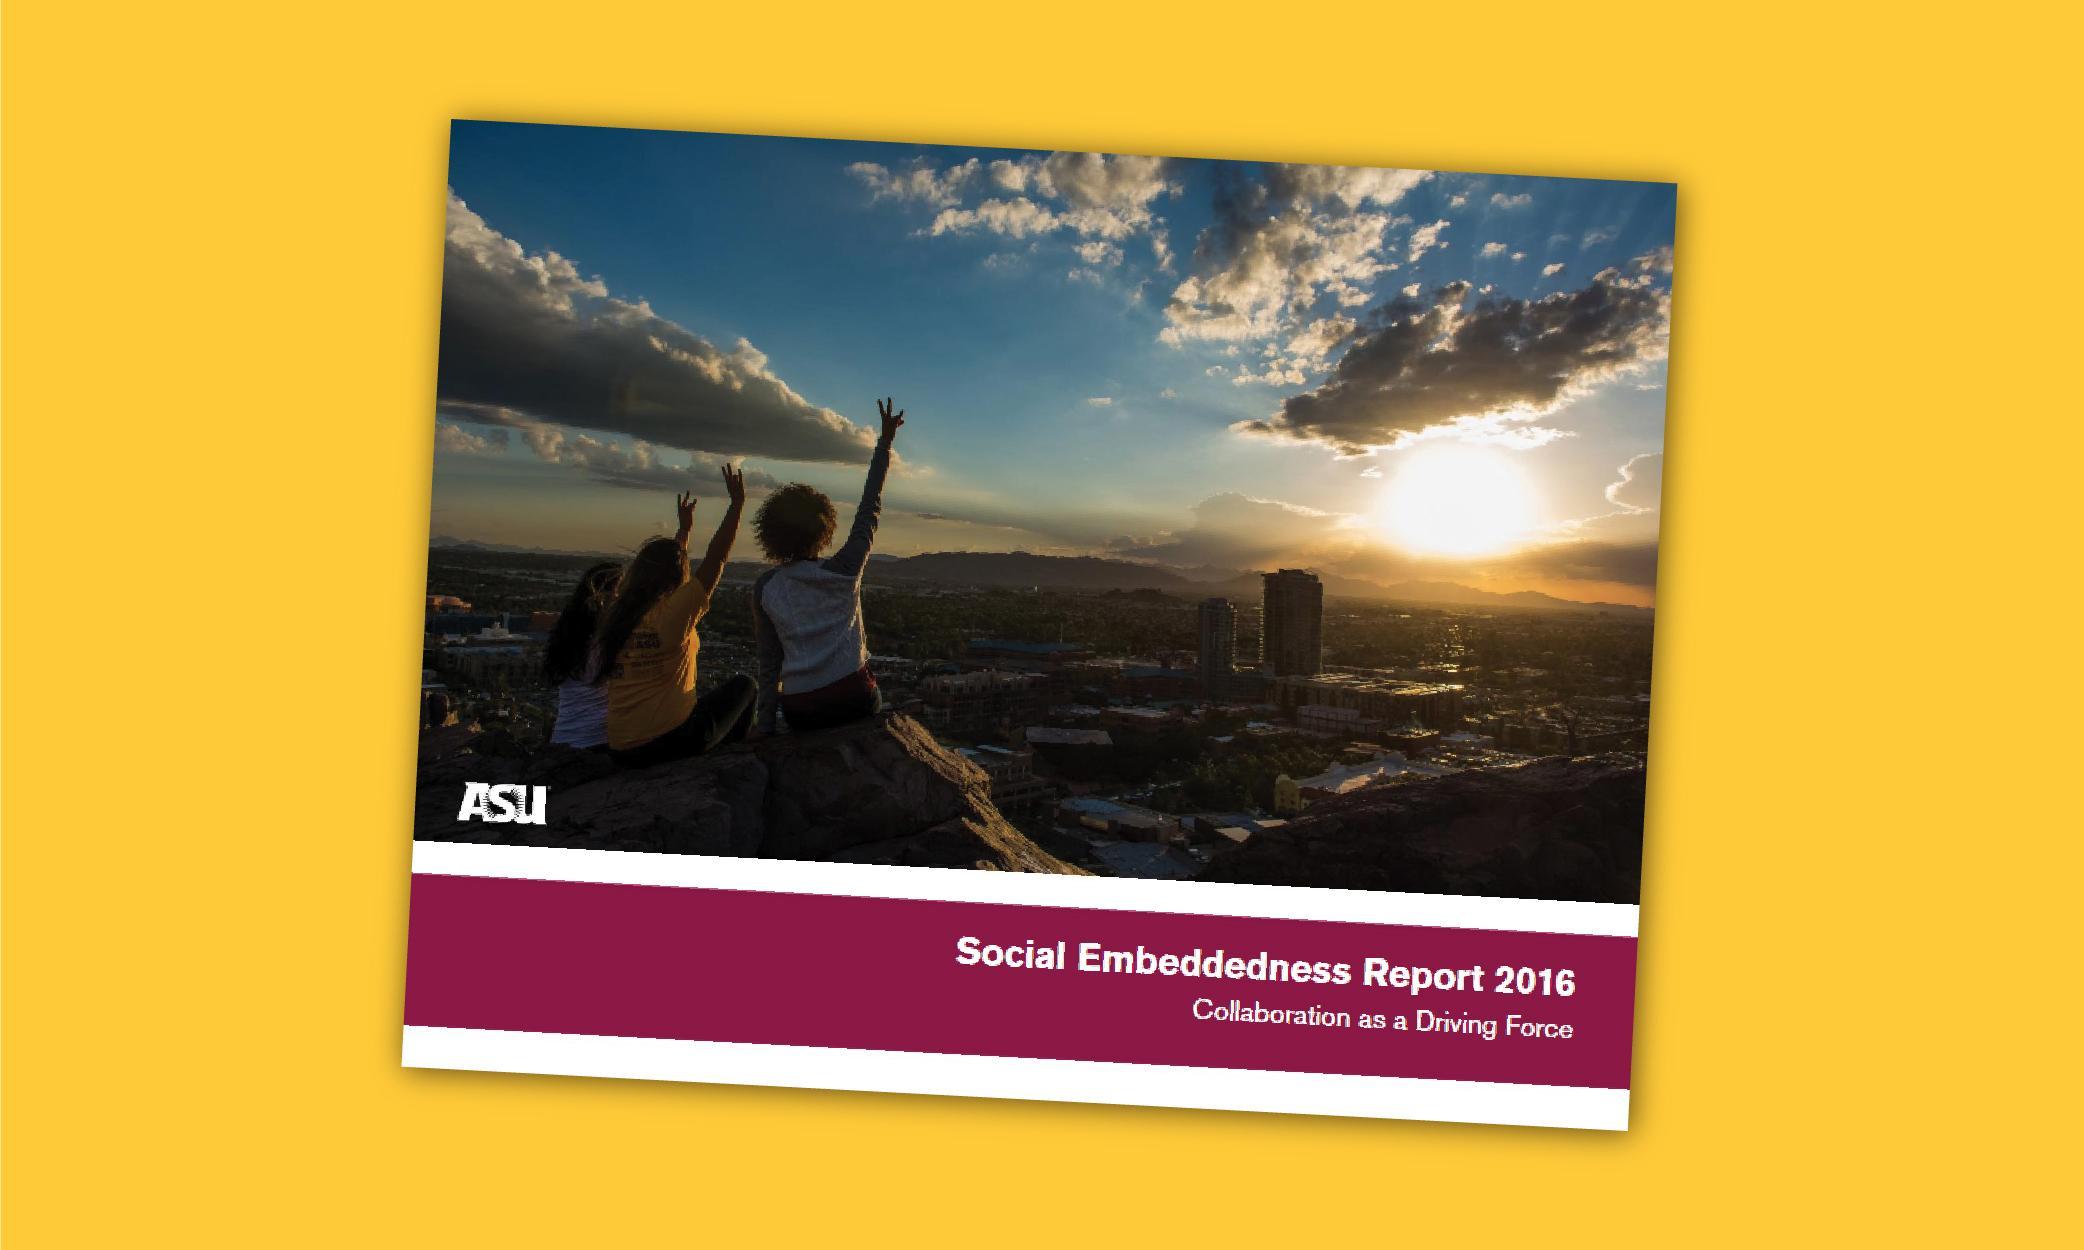 2016 Social Embeddedness Report